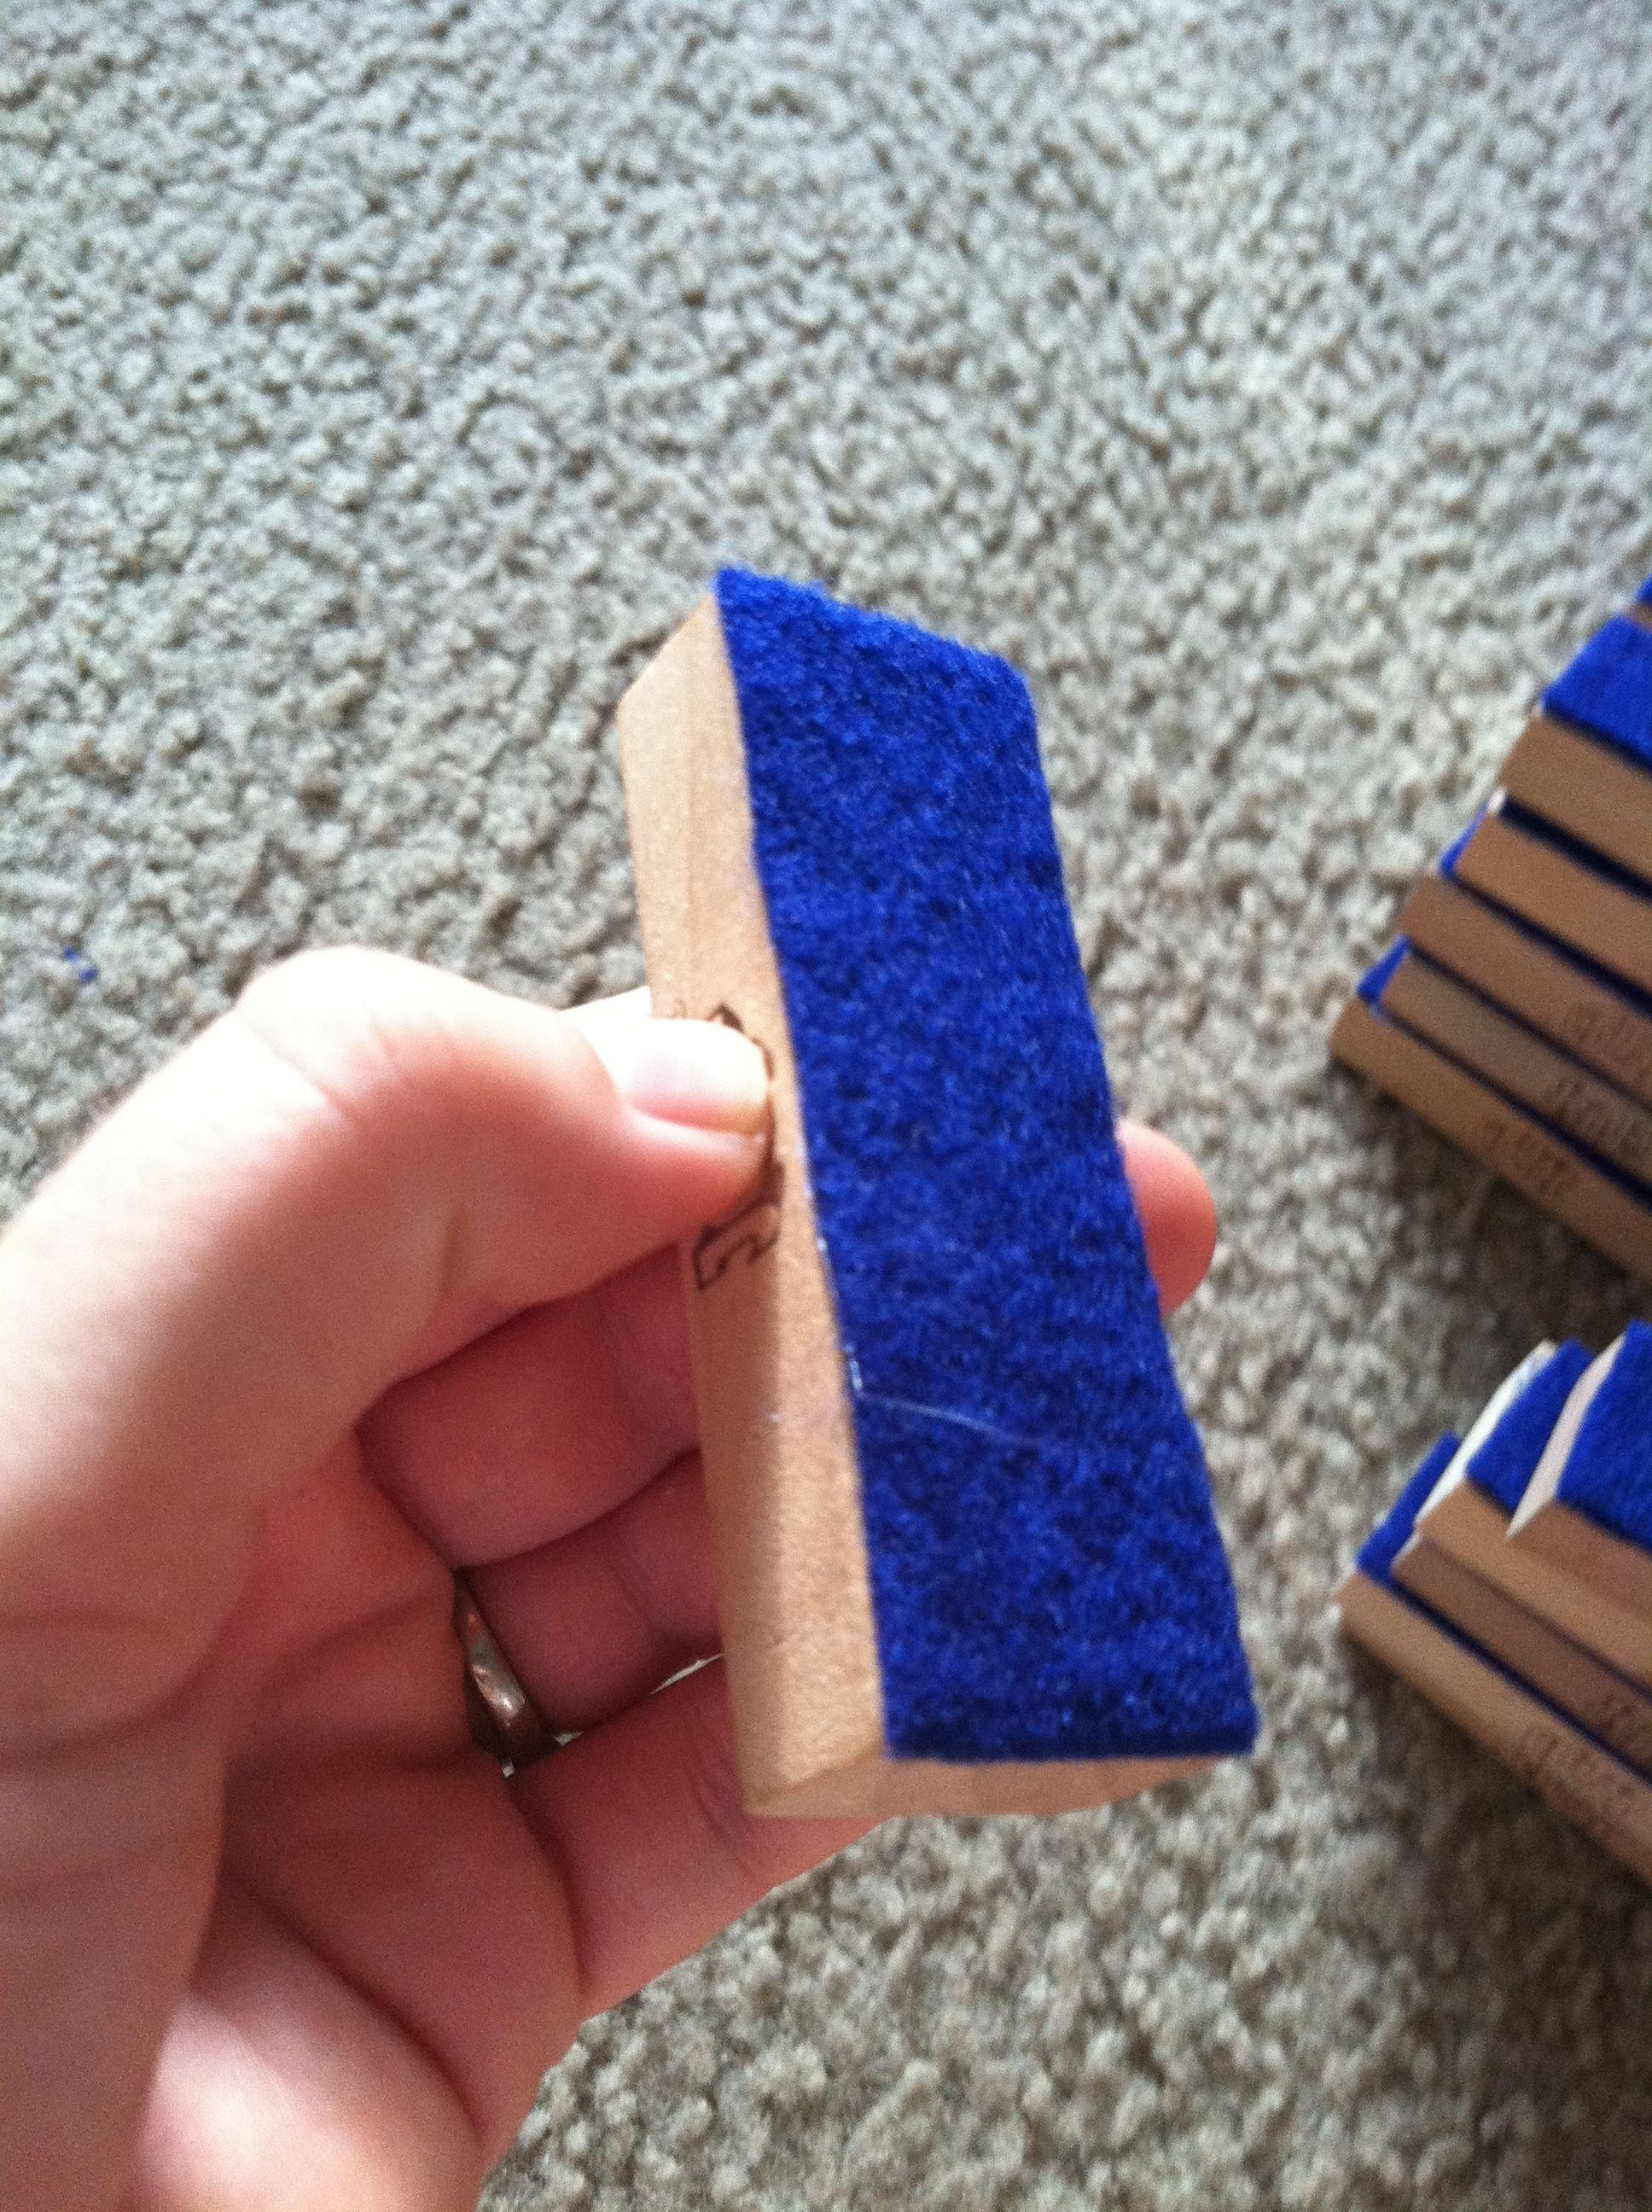 Mini Student Whiteboard Erasers Glued 23 Cent Felt From Walmart Onto Jenga Blocks No More Tissues Elementary Music Classroom Diy Classroom Creative Classroom